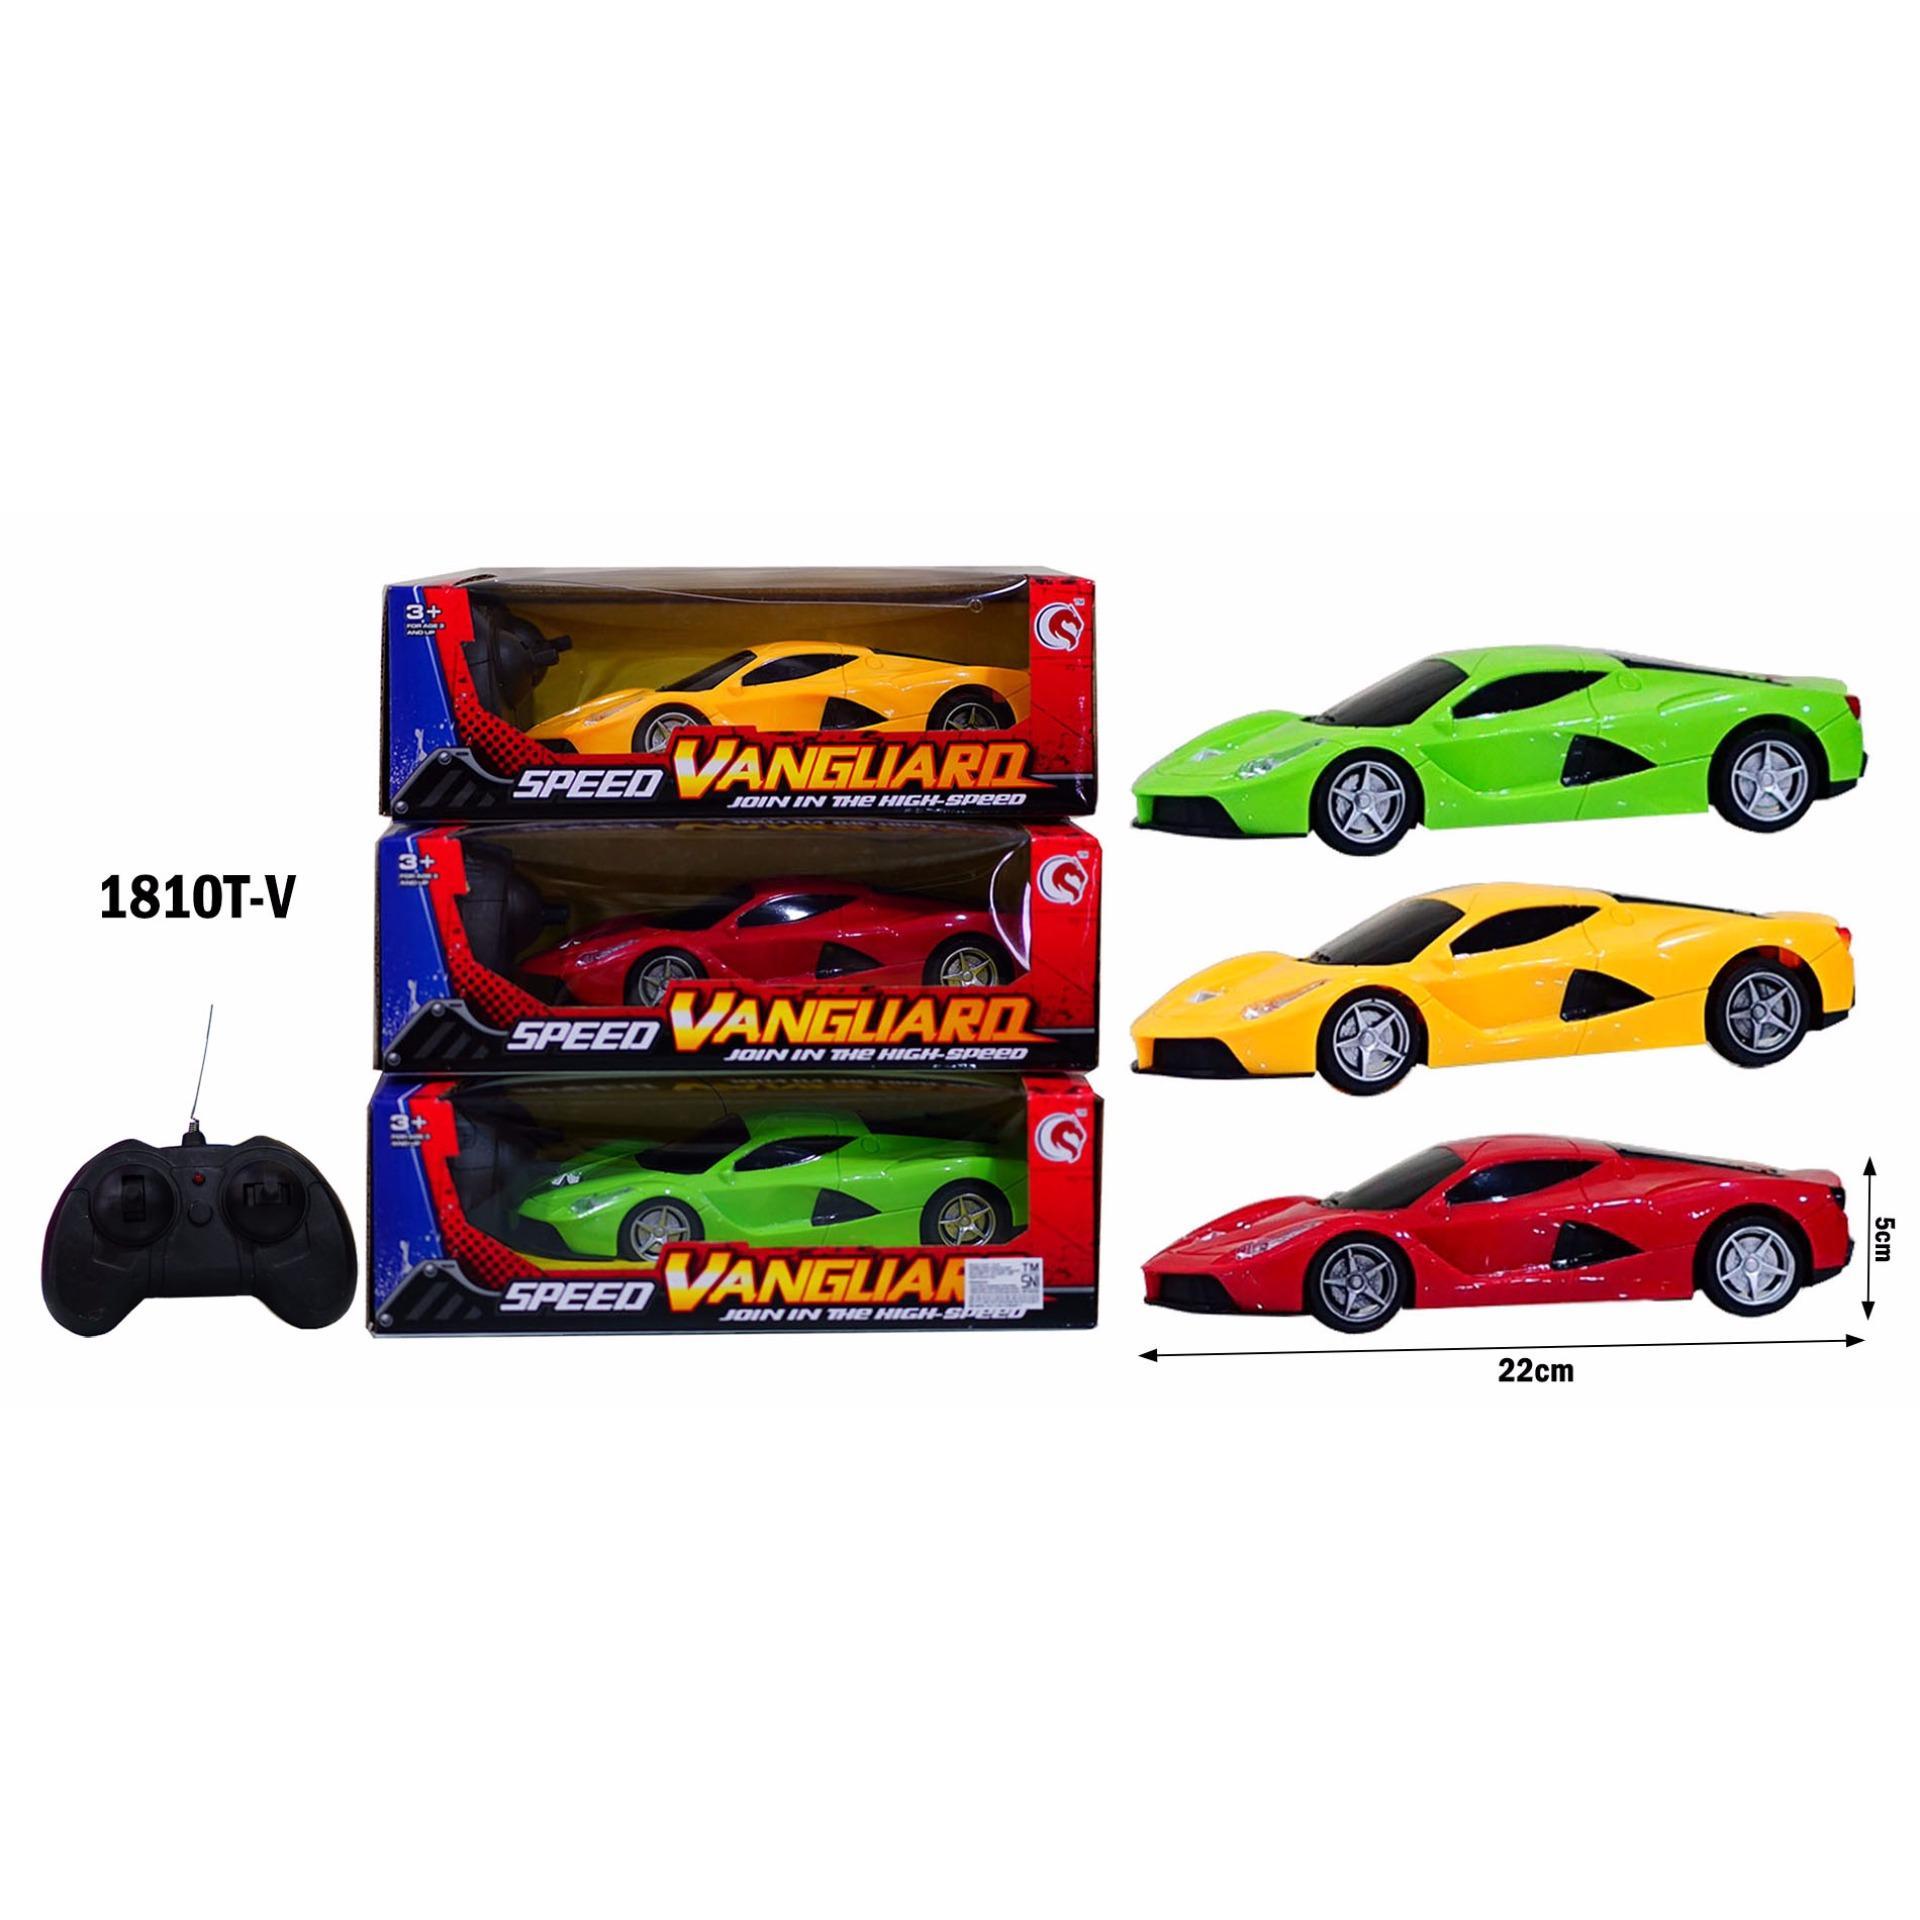 Harga Terkini Termurah Mainan Terbang Karakter Minions Ball Flash Source · Mainan Anak RC Mobil Remot